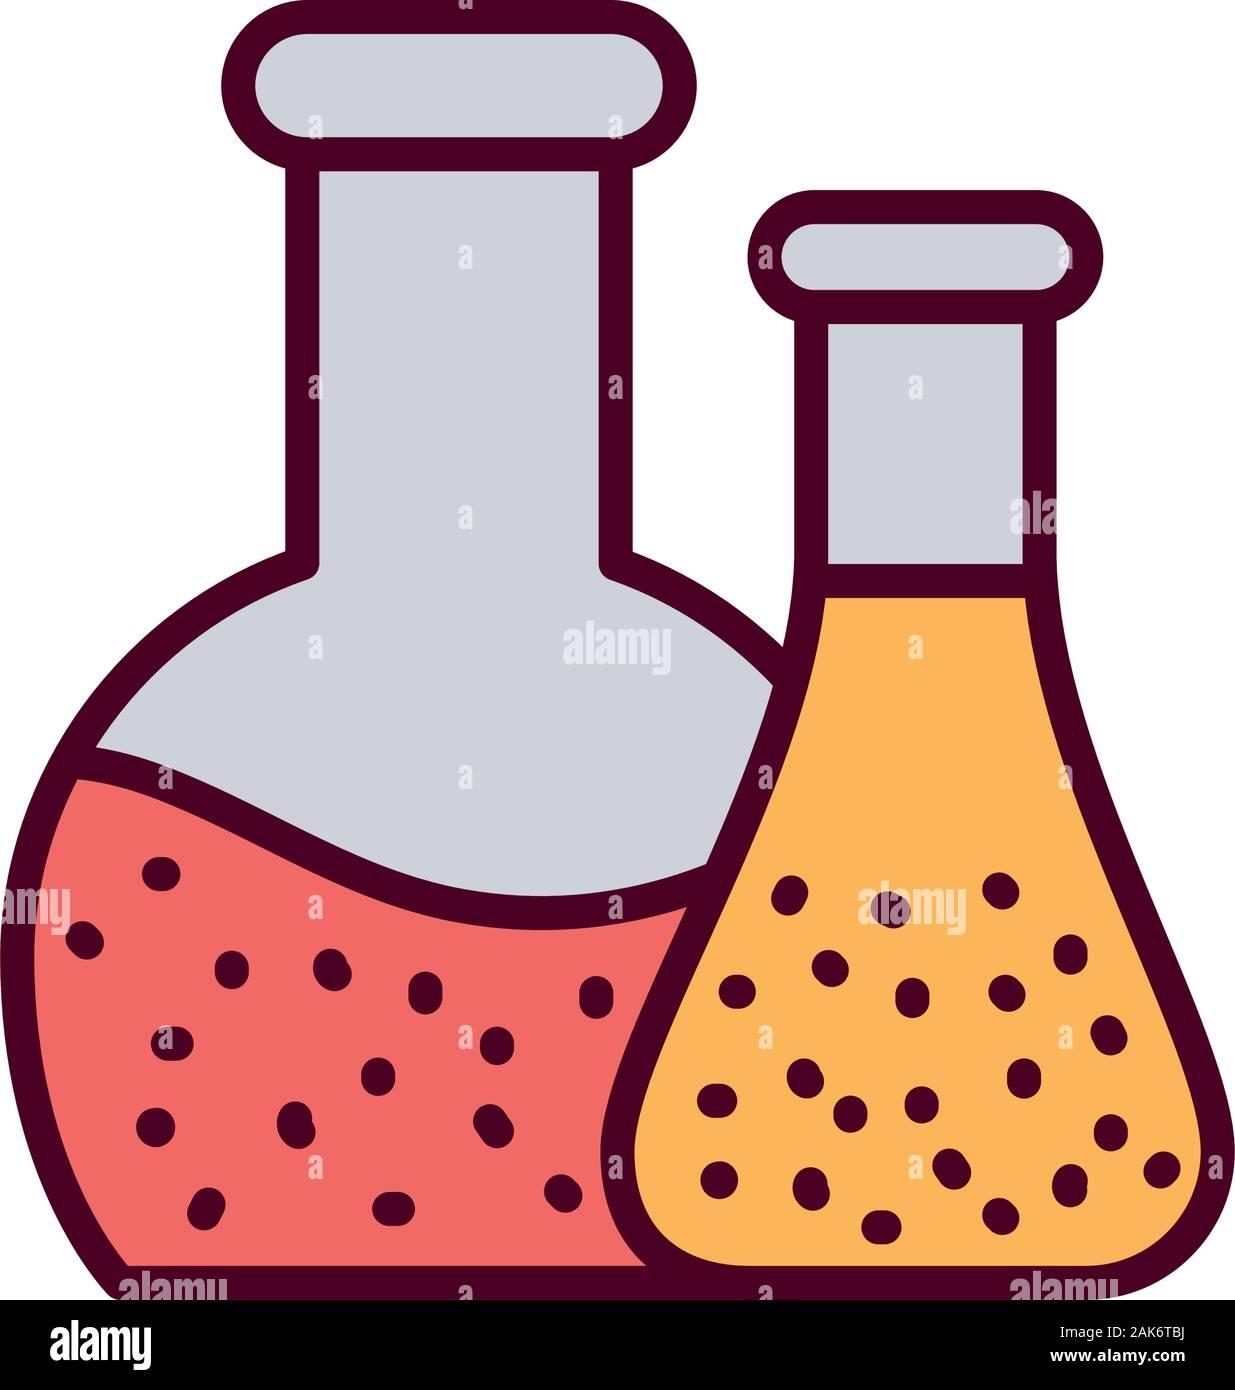 Isolierte Chemie Flaschen vektor design Stock Vektor